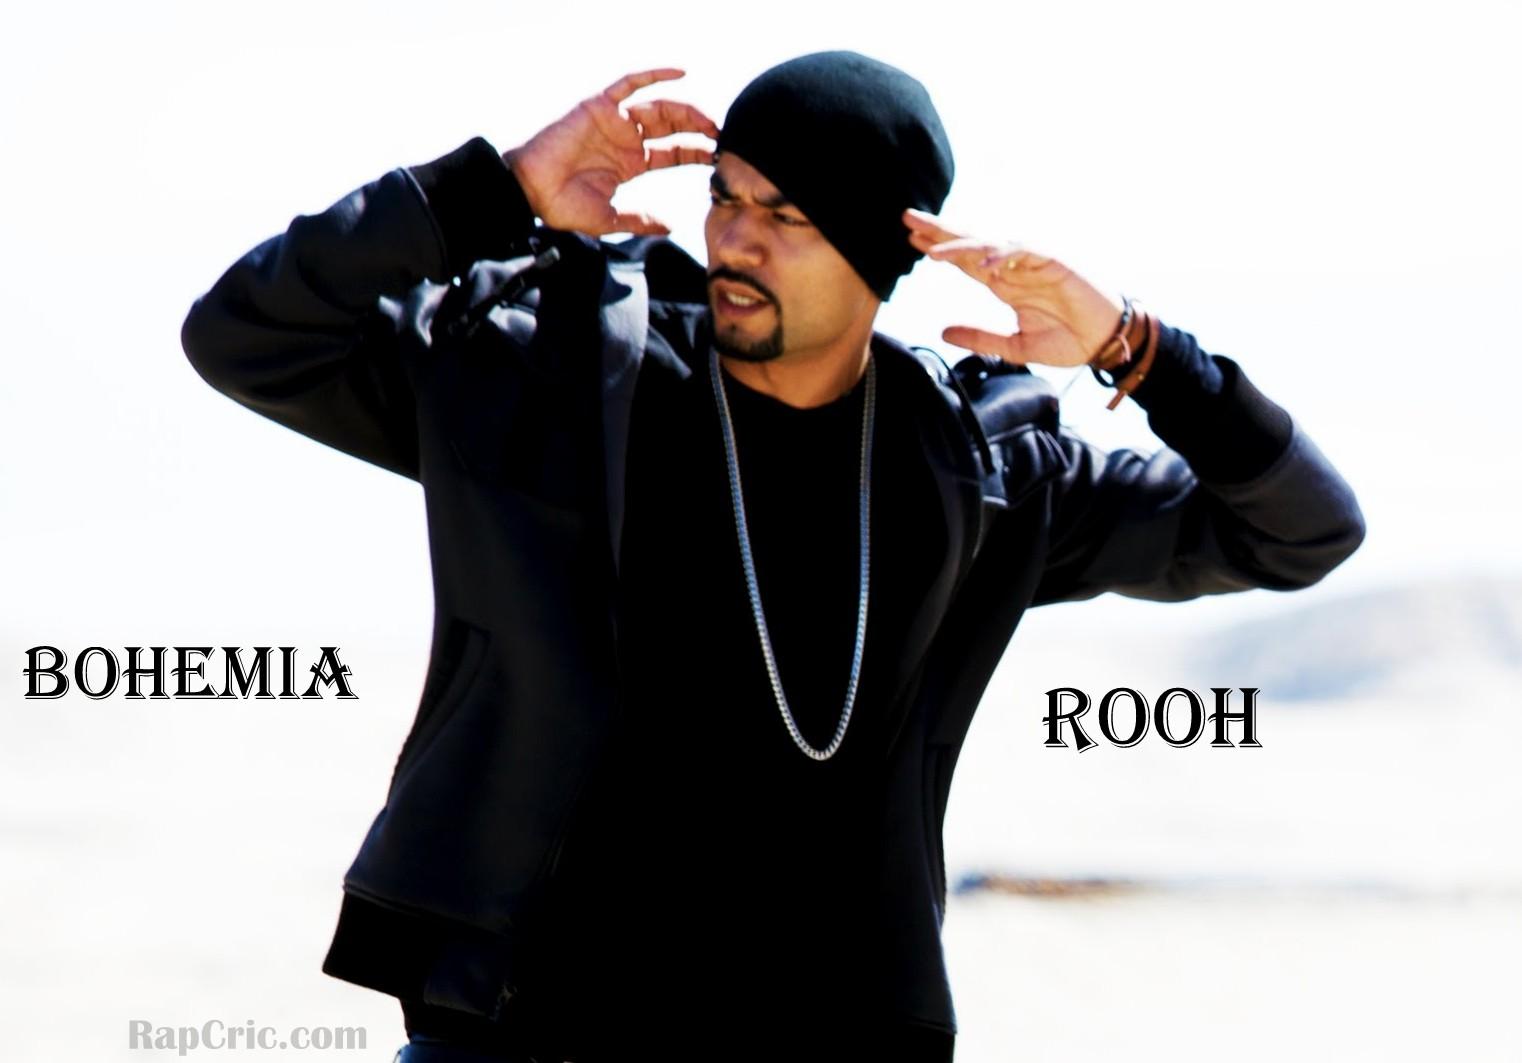 bohemia-rooh-2013-wallpaper jpgBohemia Rooh